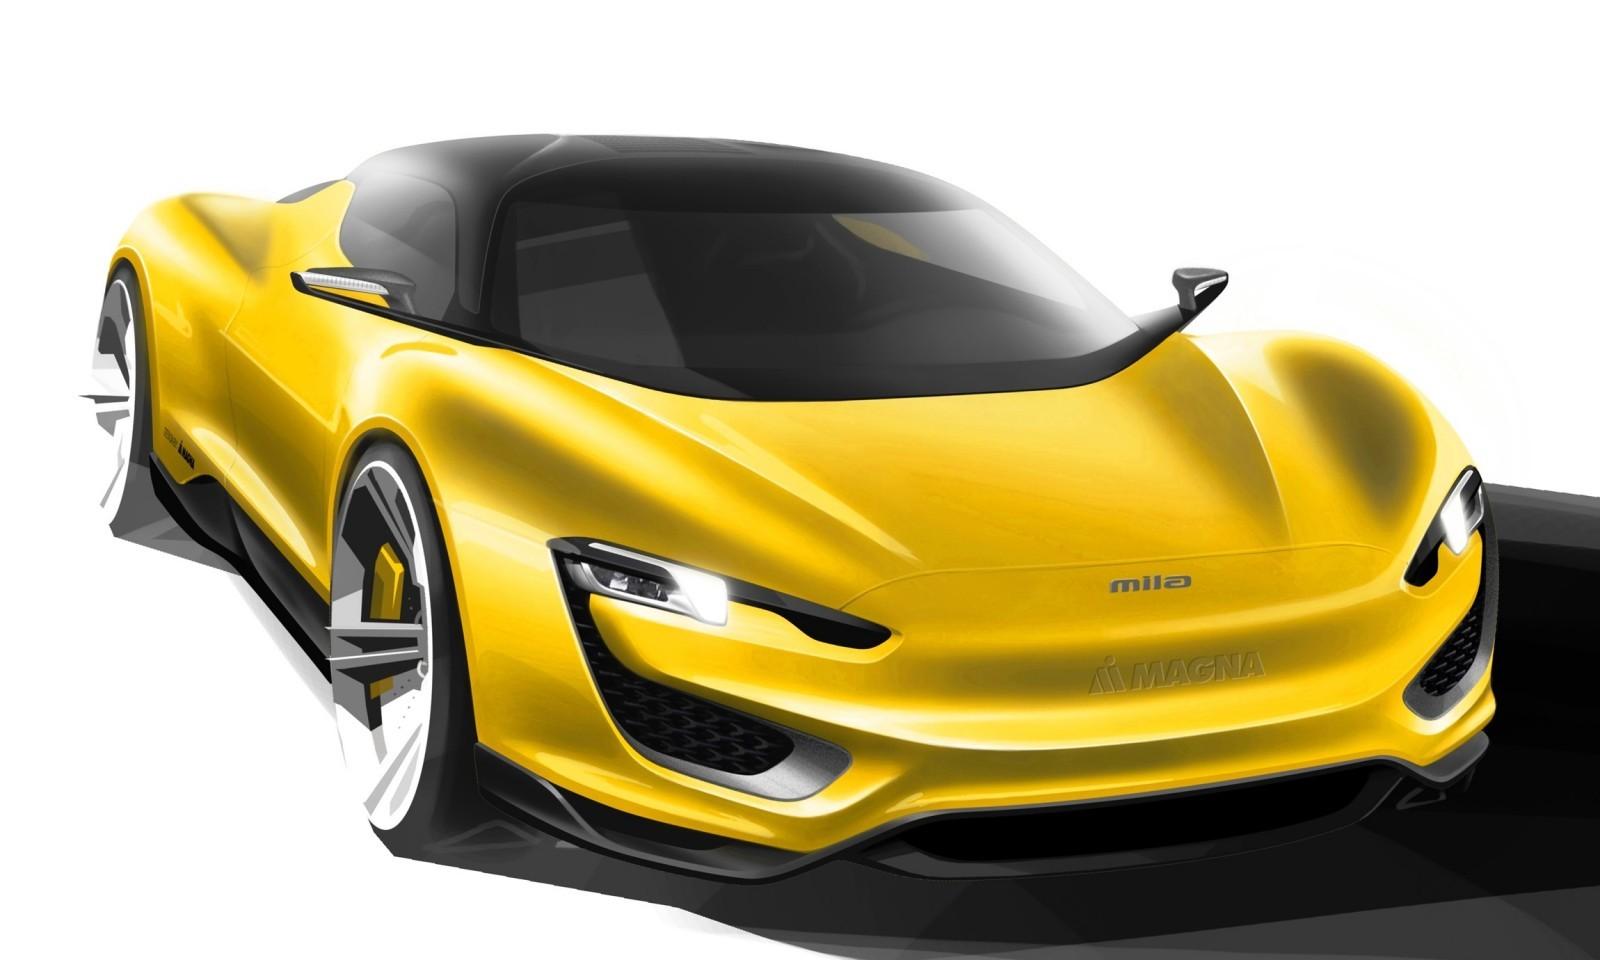 2015 Magna Steyr MILA Plus 4